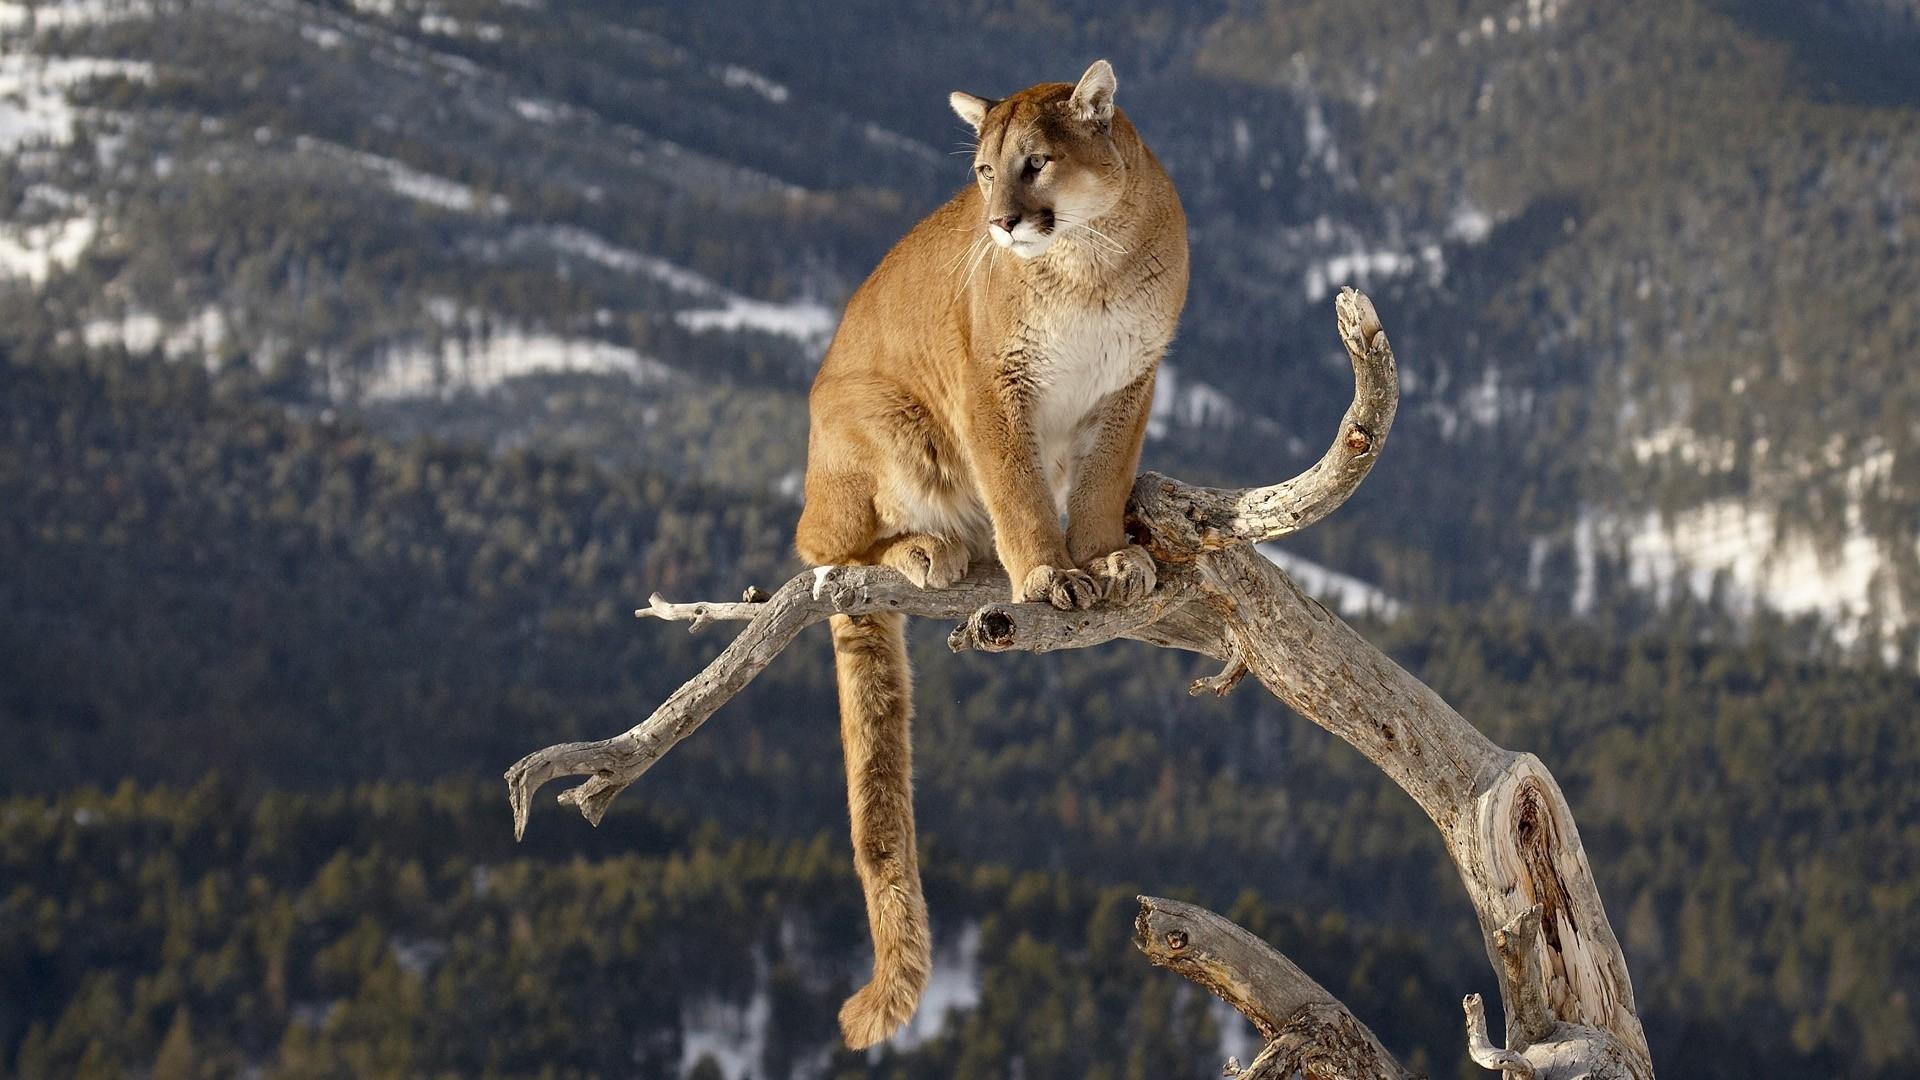 HD Wallpaper   Background ID:377116. 1920x1080 Animal Cougar